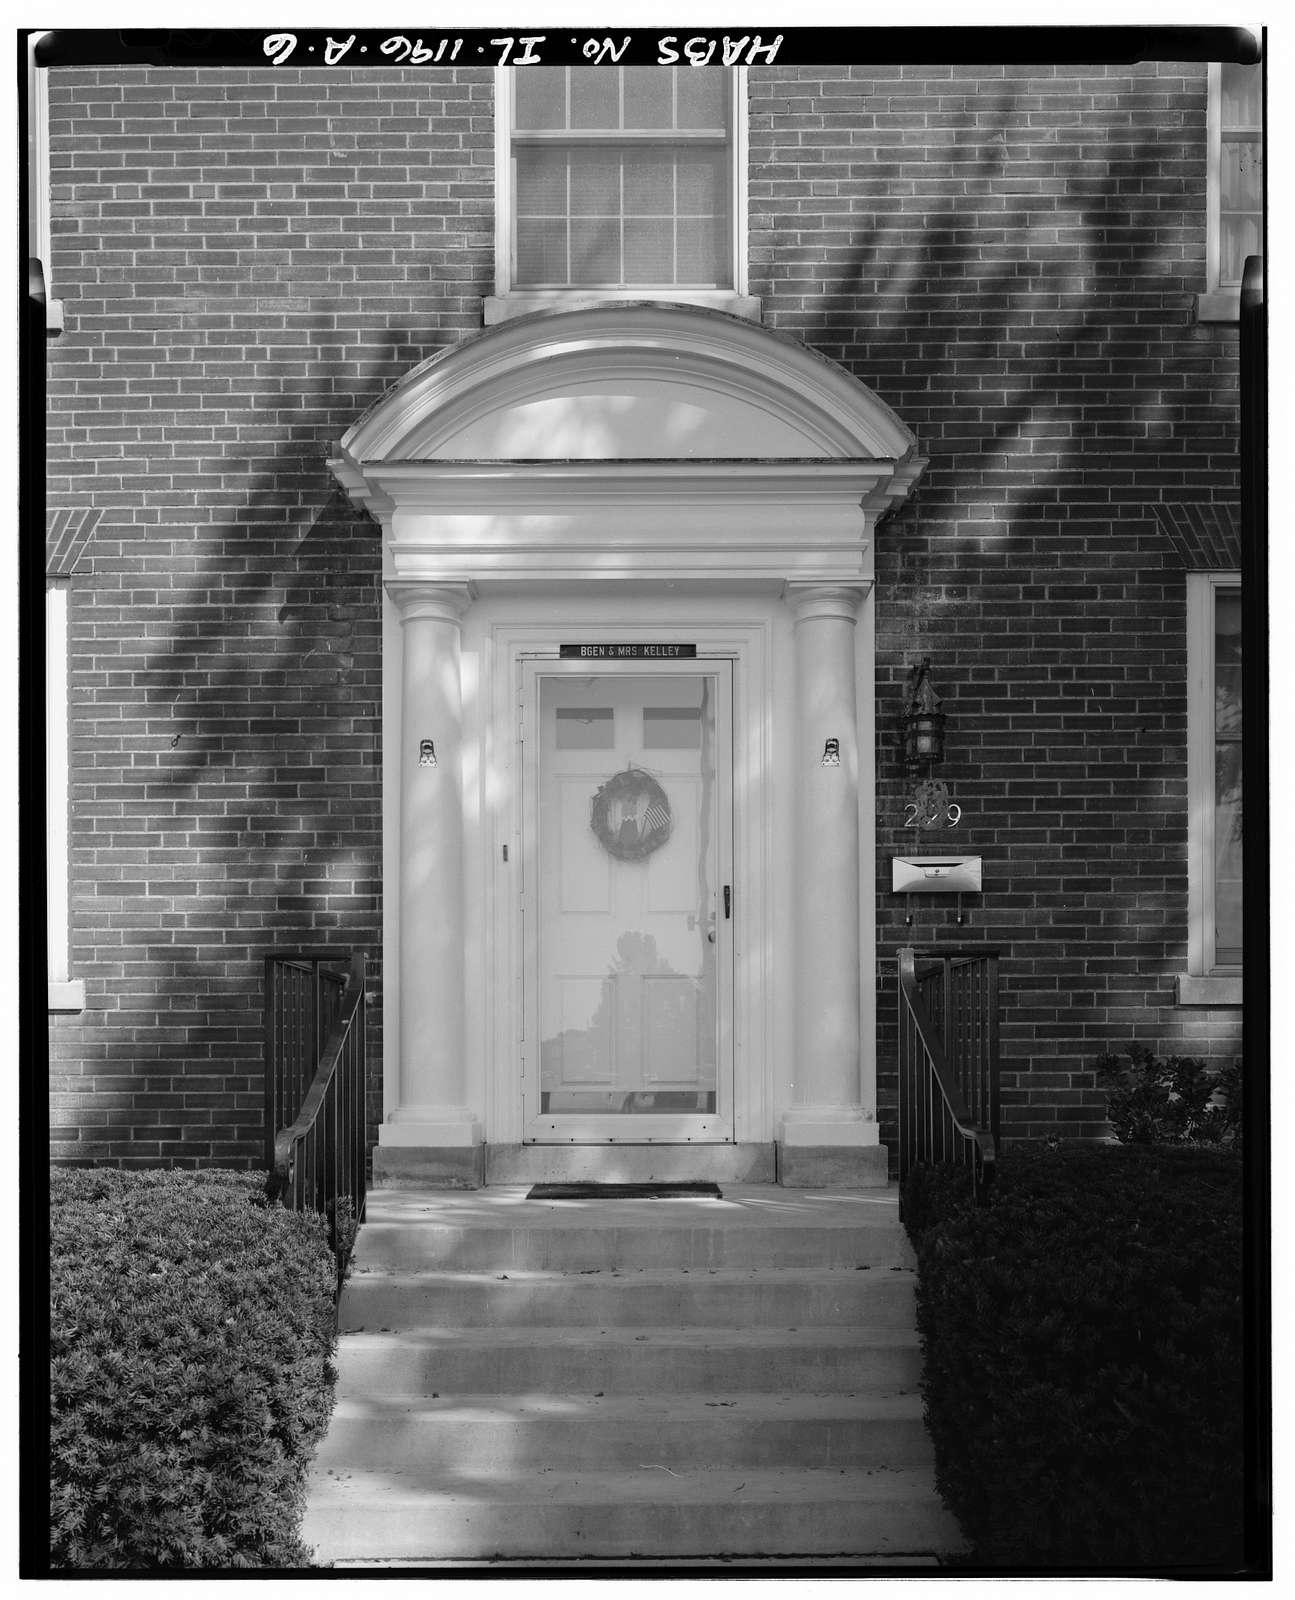 Scott Air Force Base, General Officer Quarters, 229 Birchard Street, O'Fallon, St. Clair County, IL